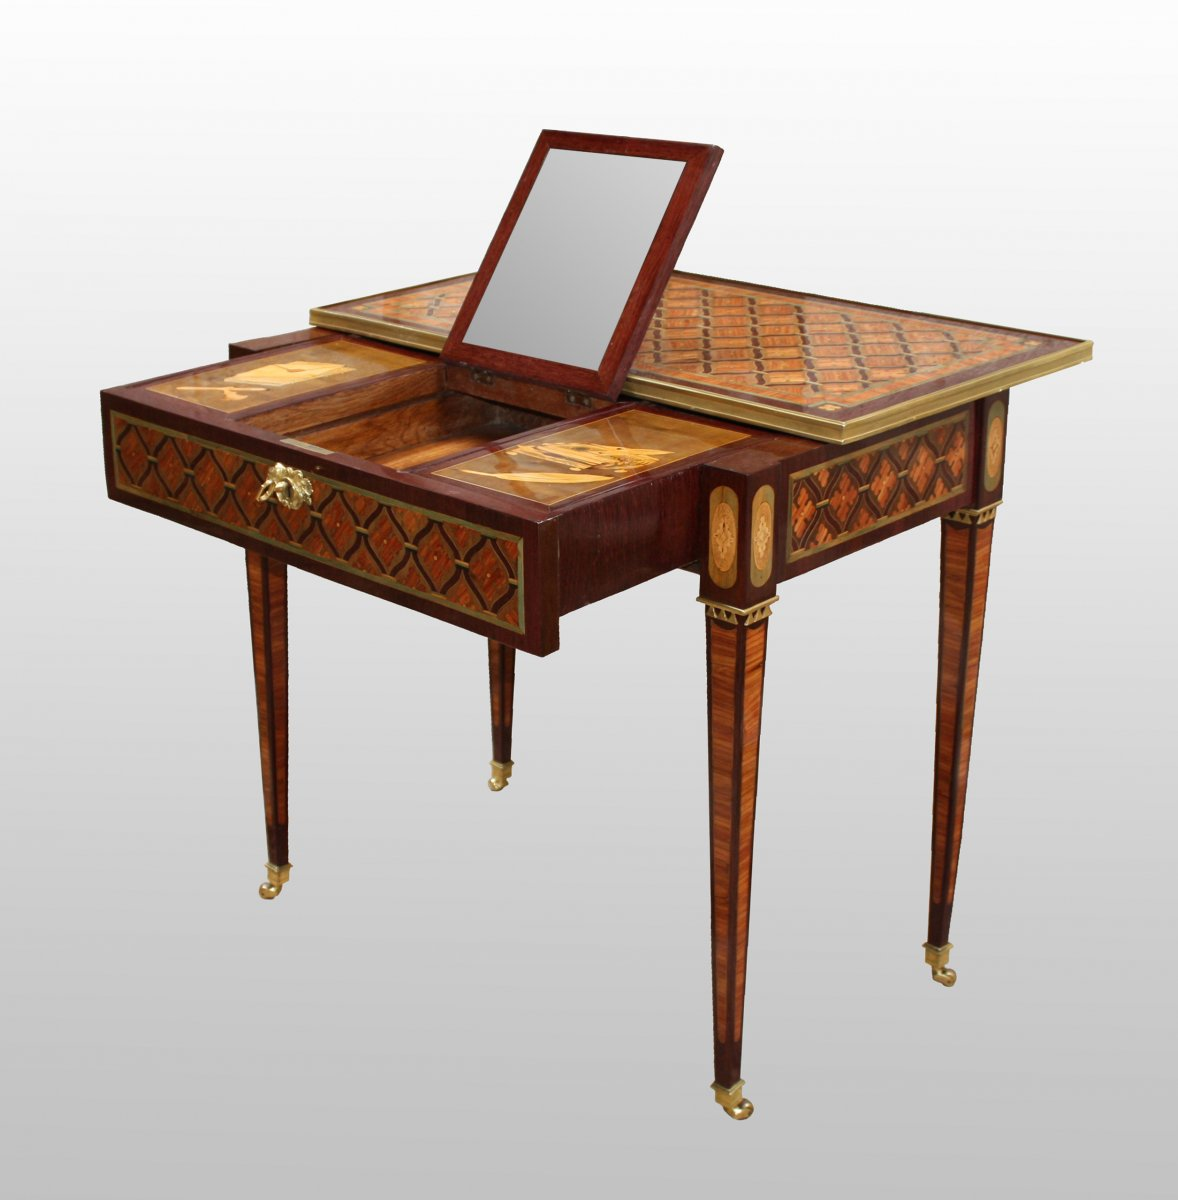 Table à Glissière en marqueterie  XVIIIe siècle  N53395